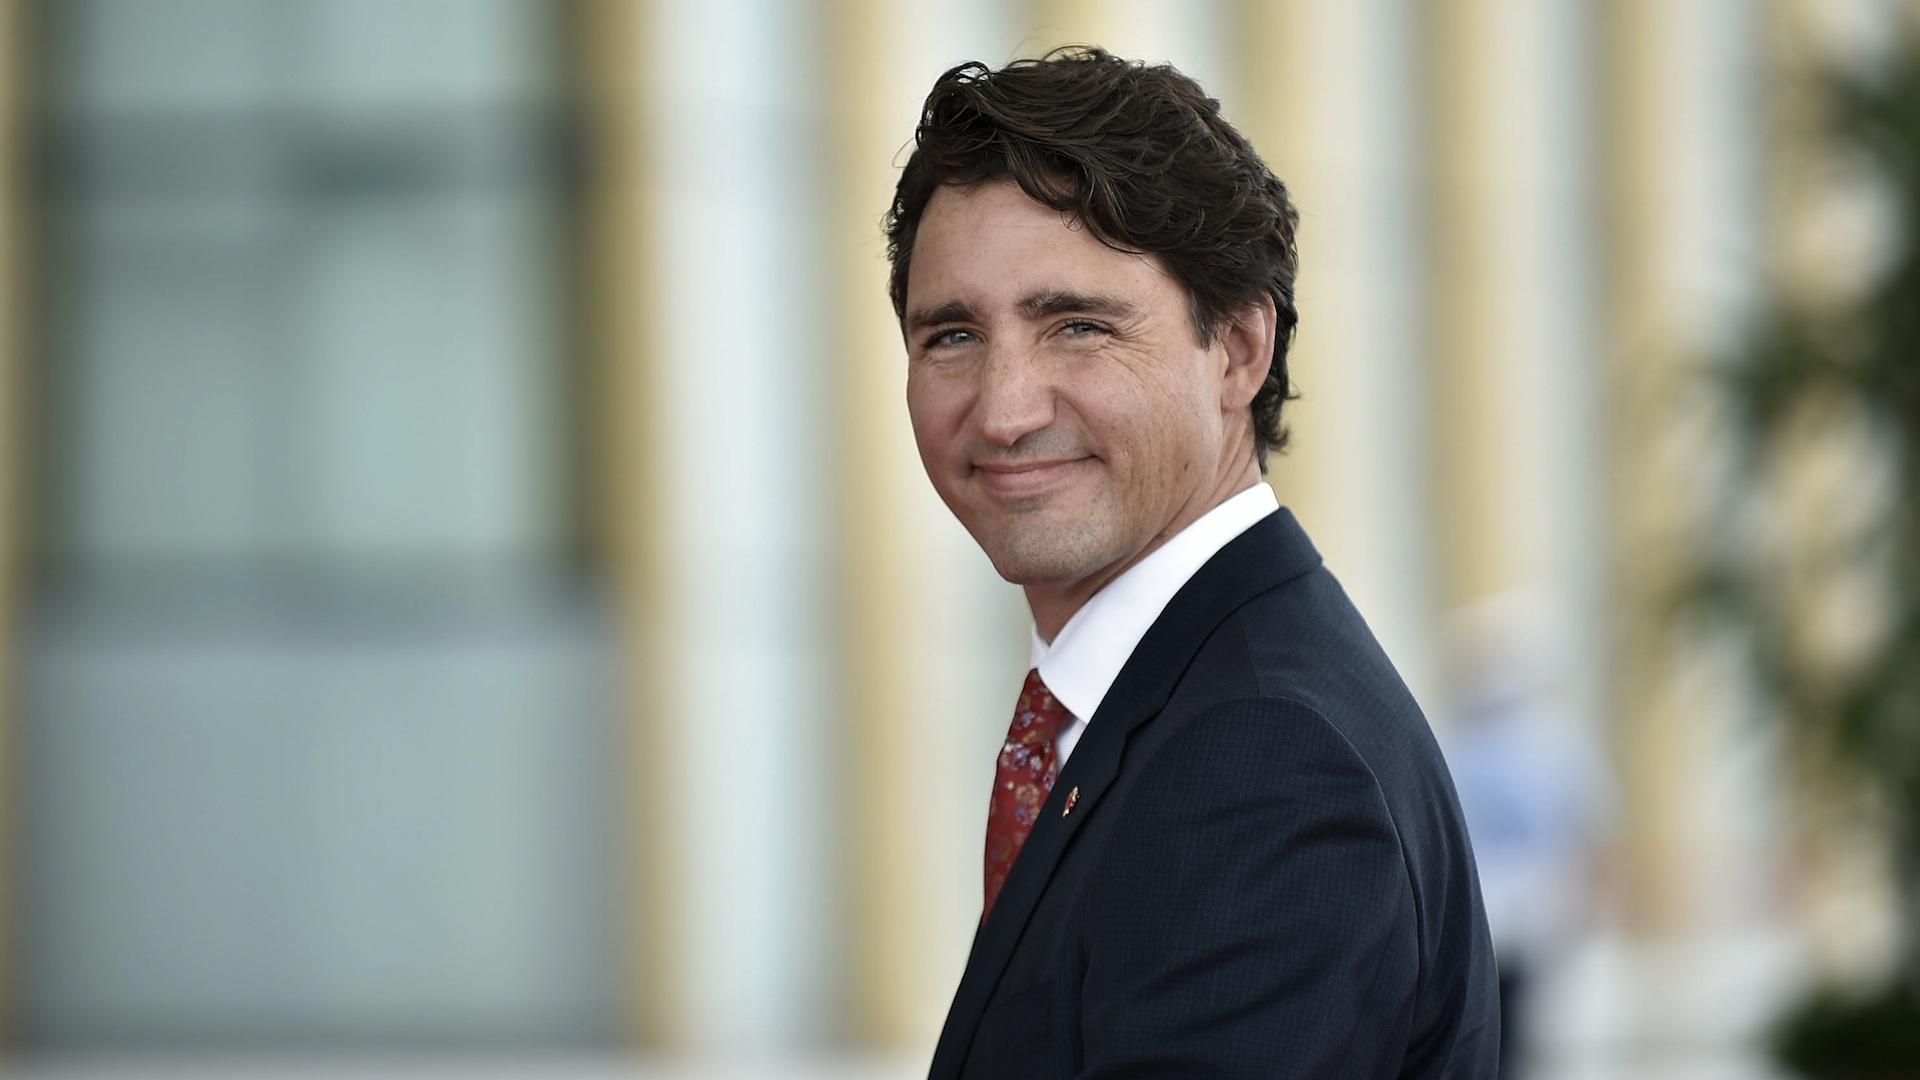 Image Etienne Oliveau Getty Images News